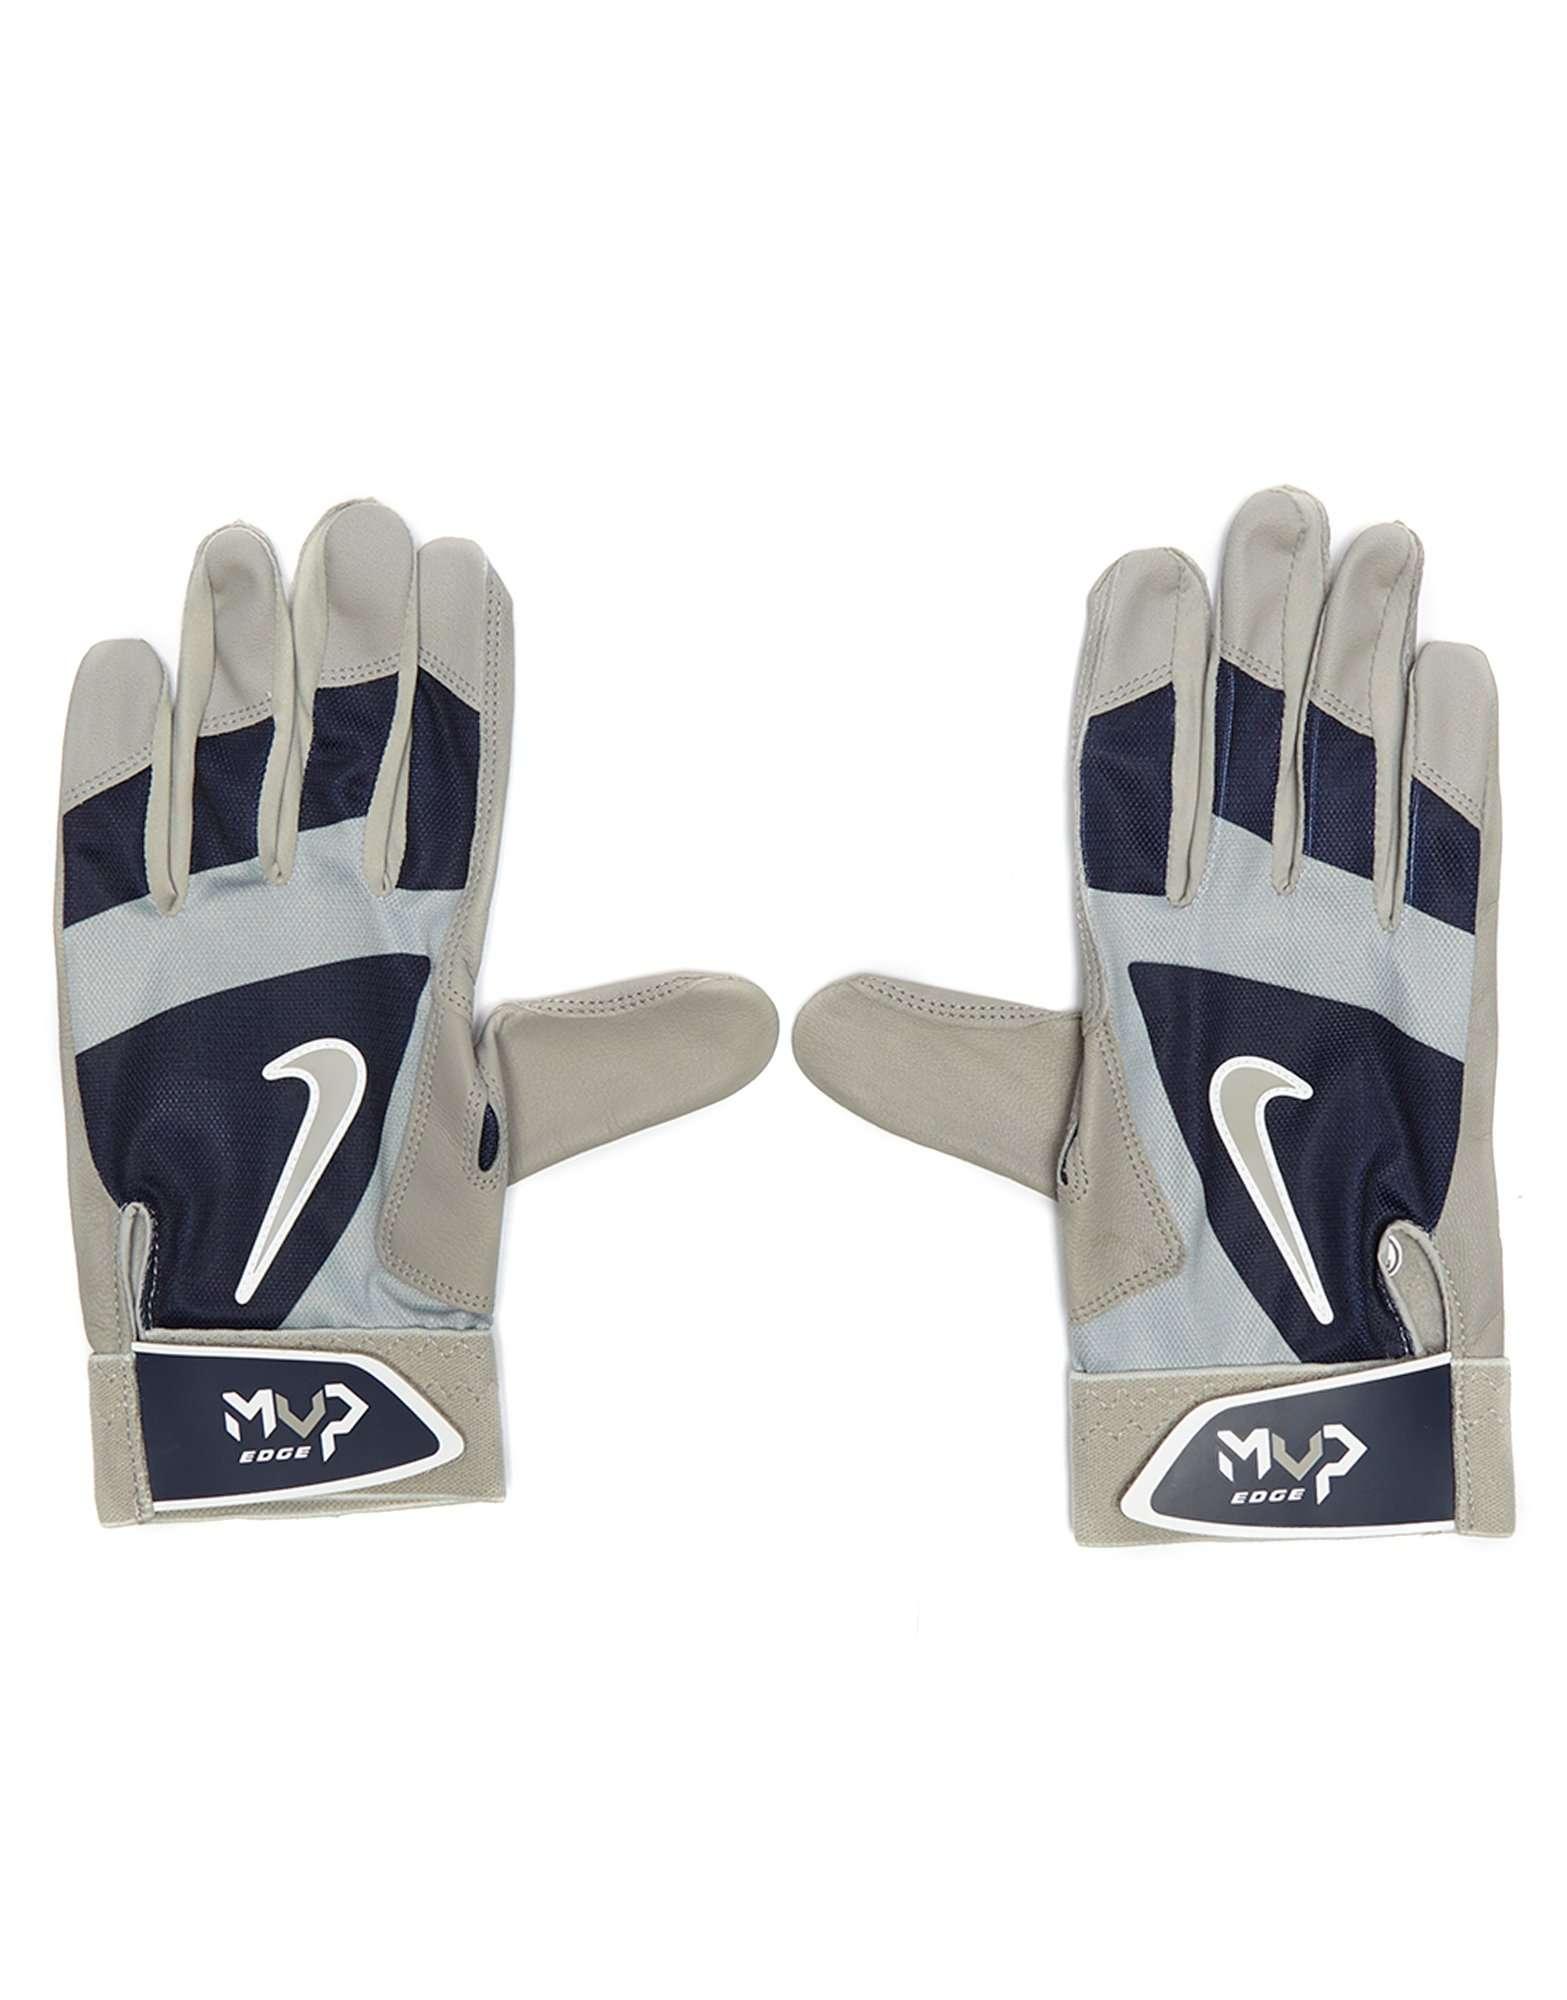 Leather gloves mens jd - Leather Gloves Mens Jd 7